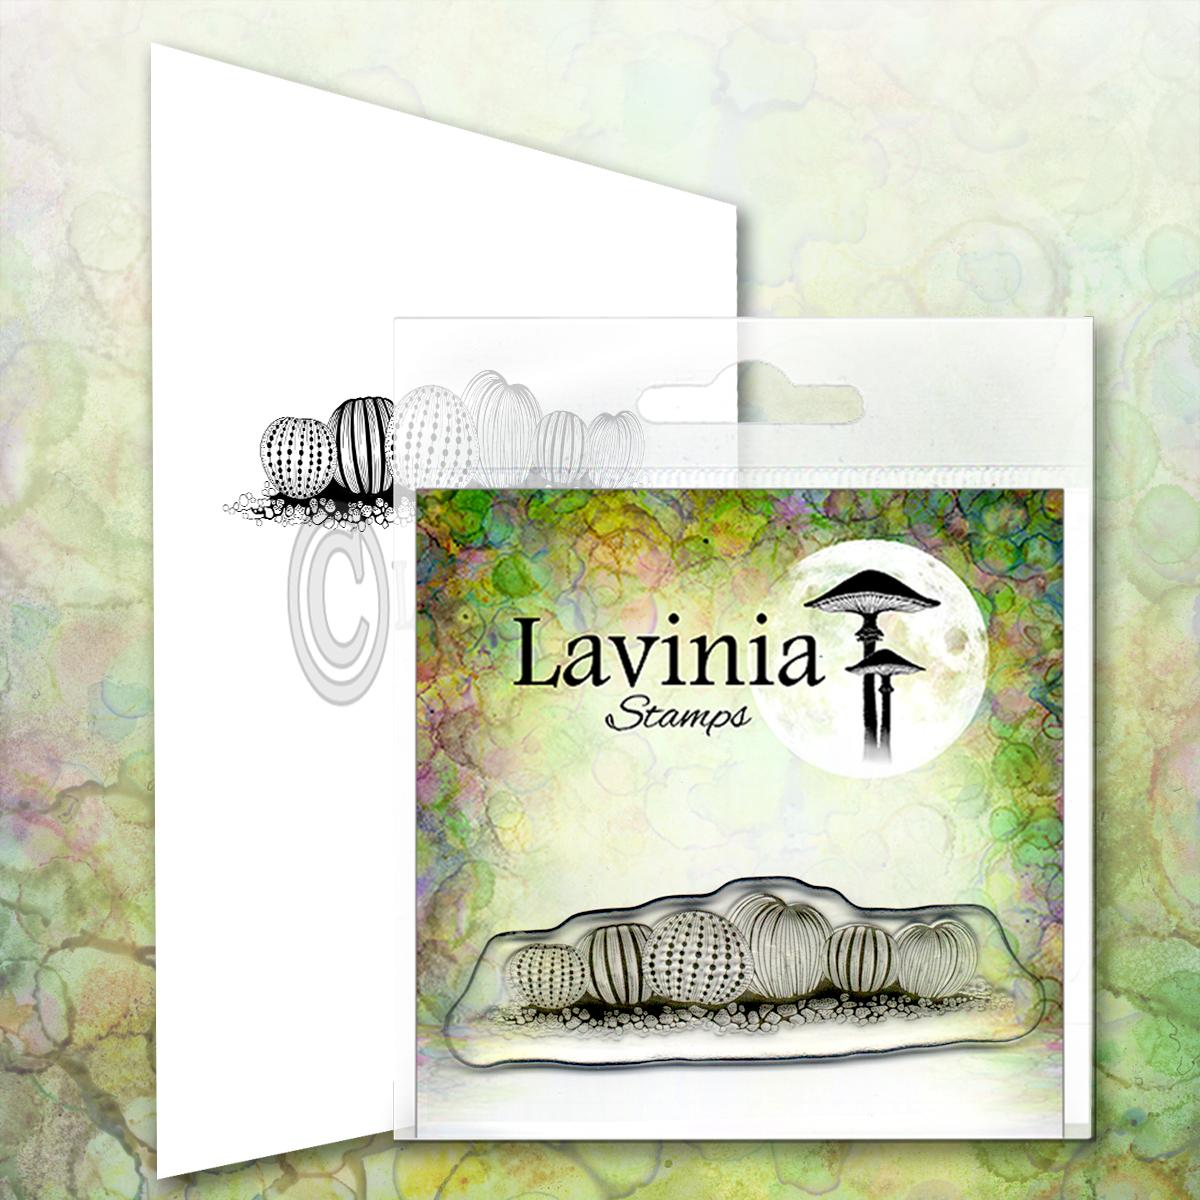 Urchins - LAV631